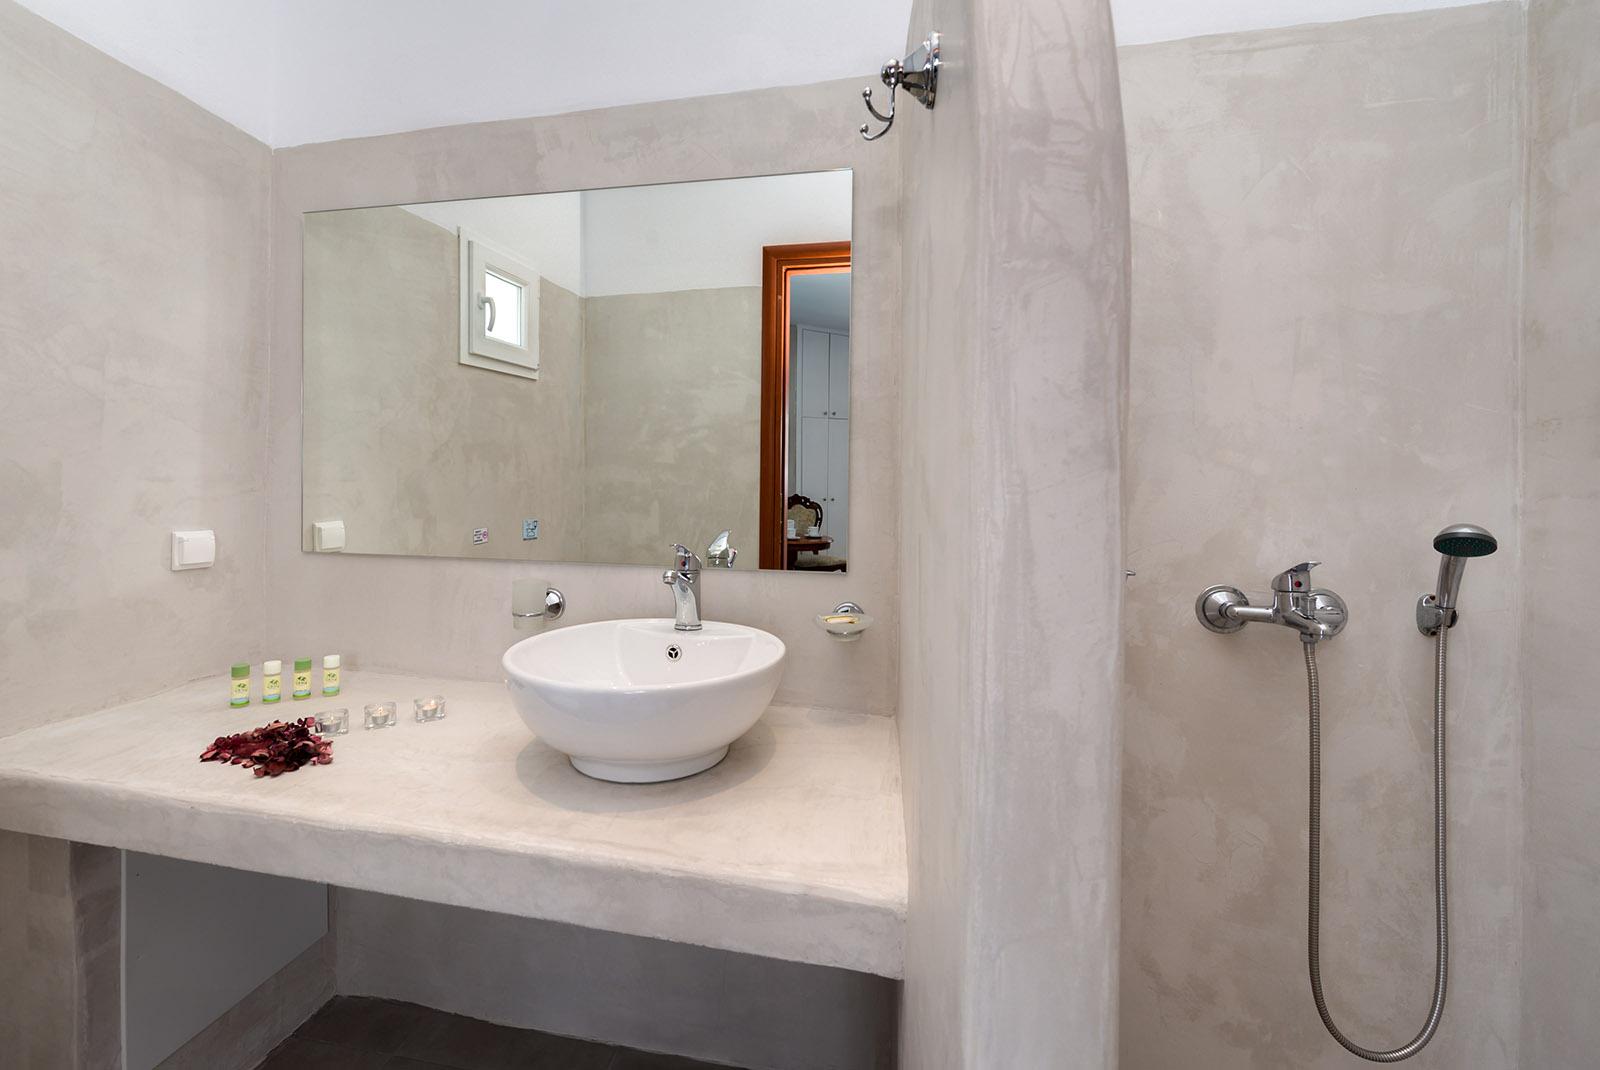 accommodation in santorini - Gizis Exclusive Santorini Greece